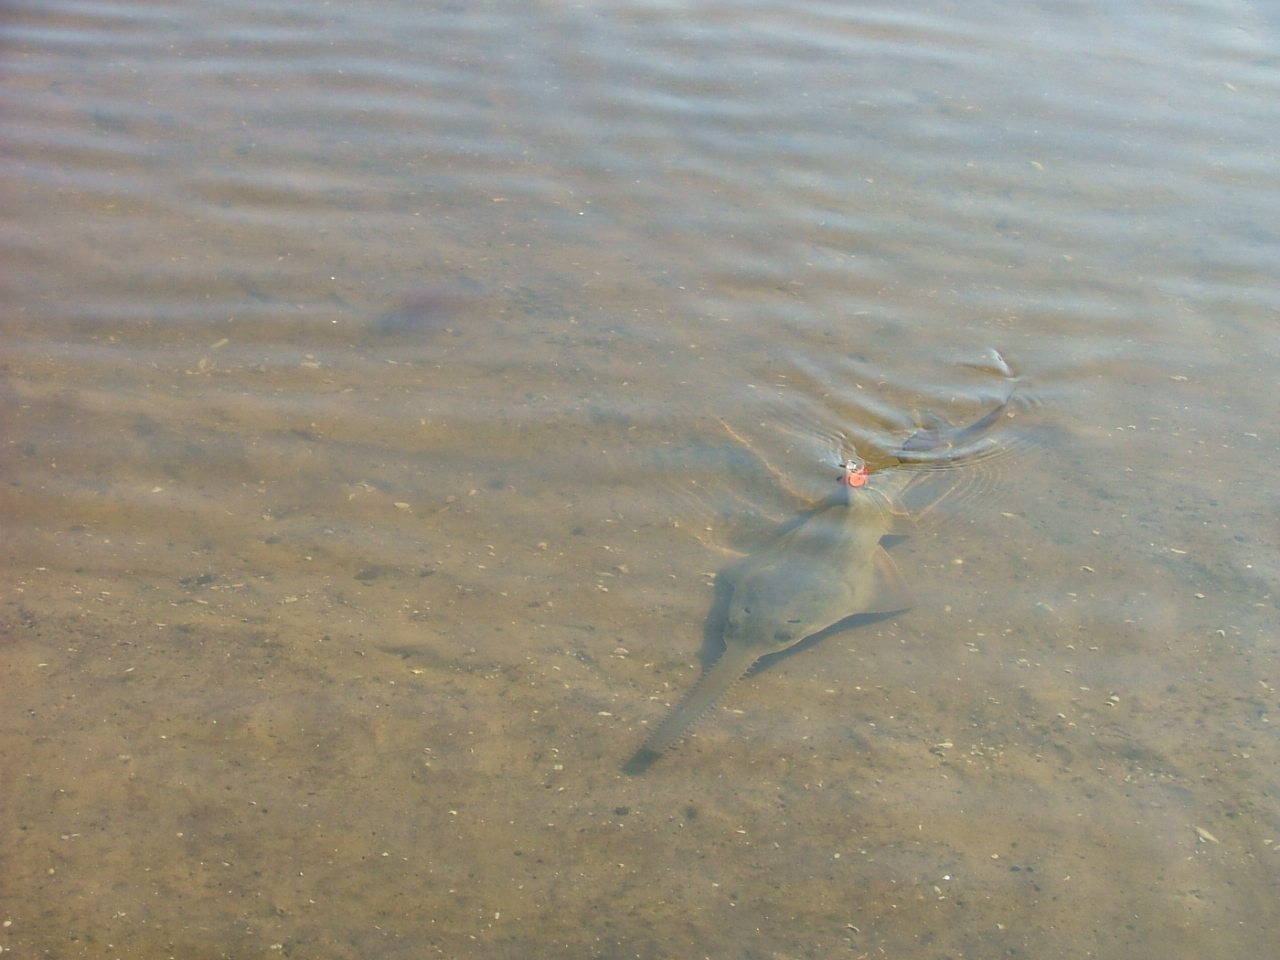 Sawfish Photo by Beau Yeiser